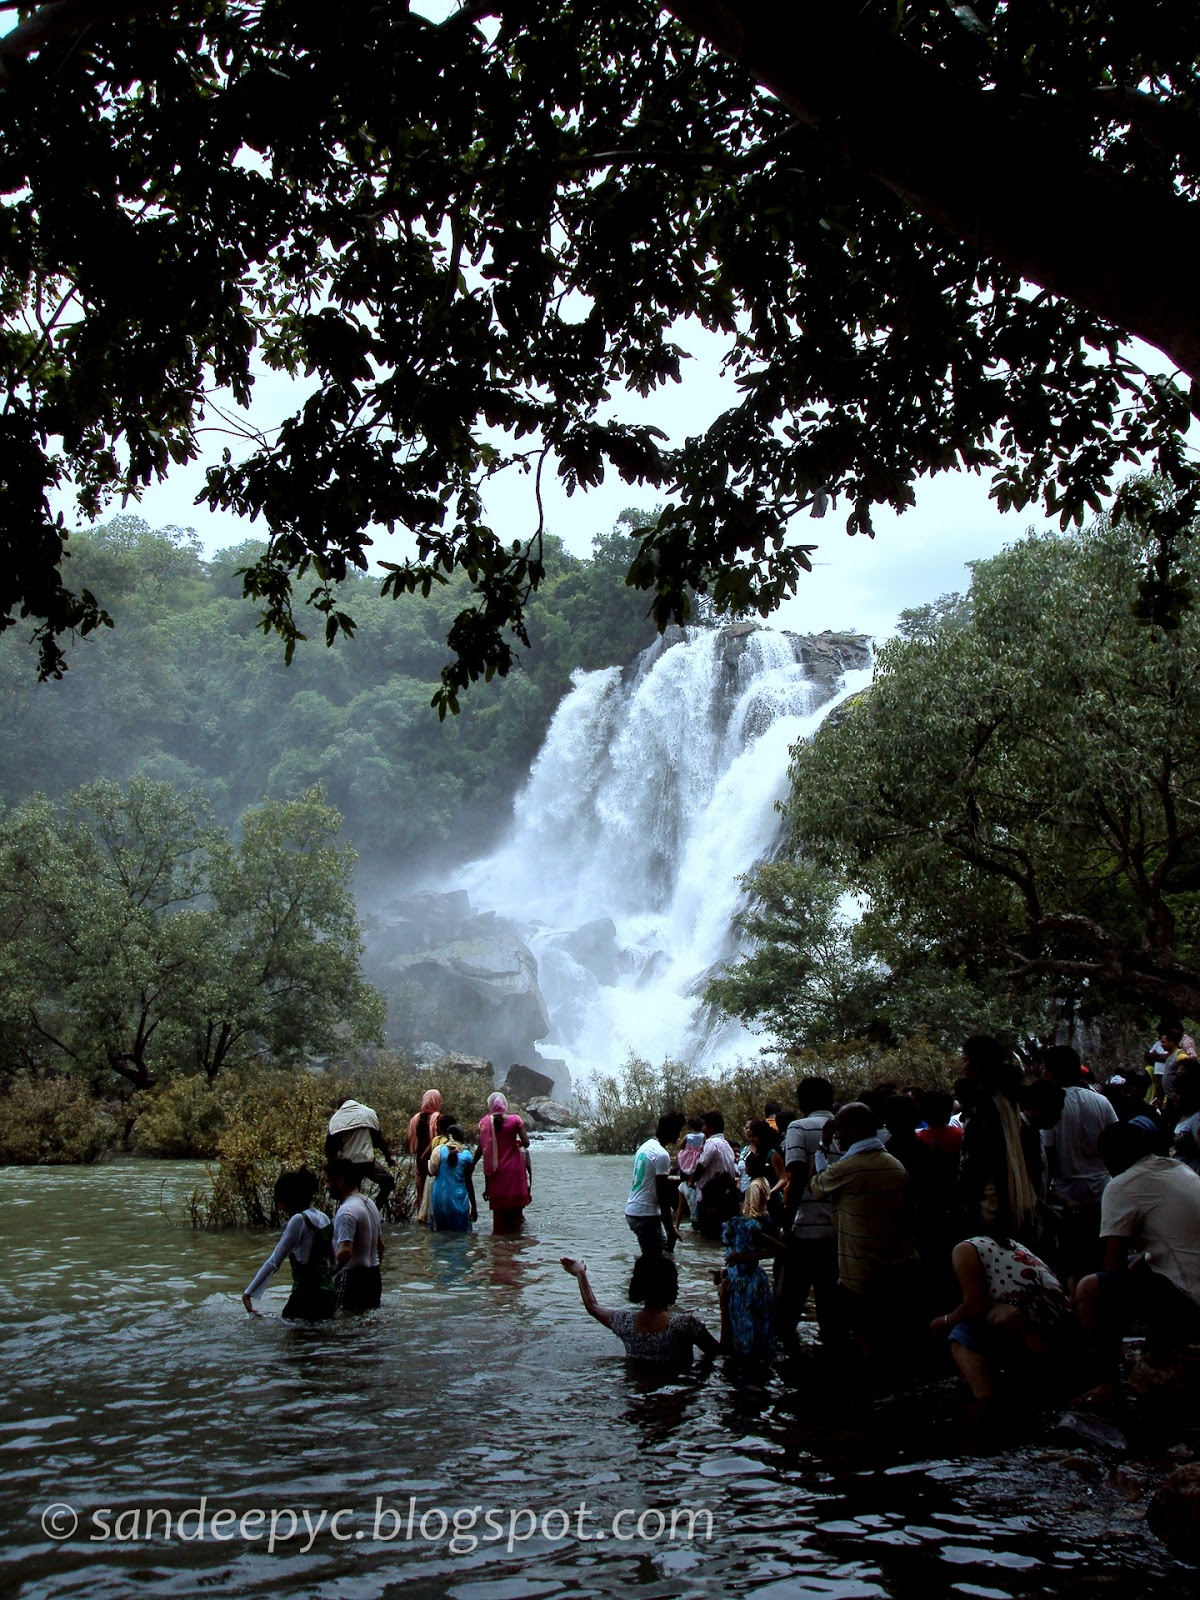 Bharachukki falls